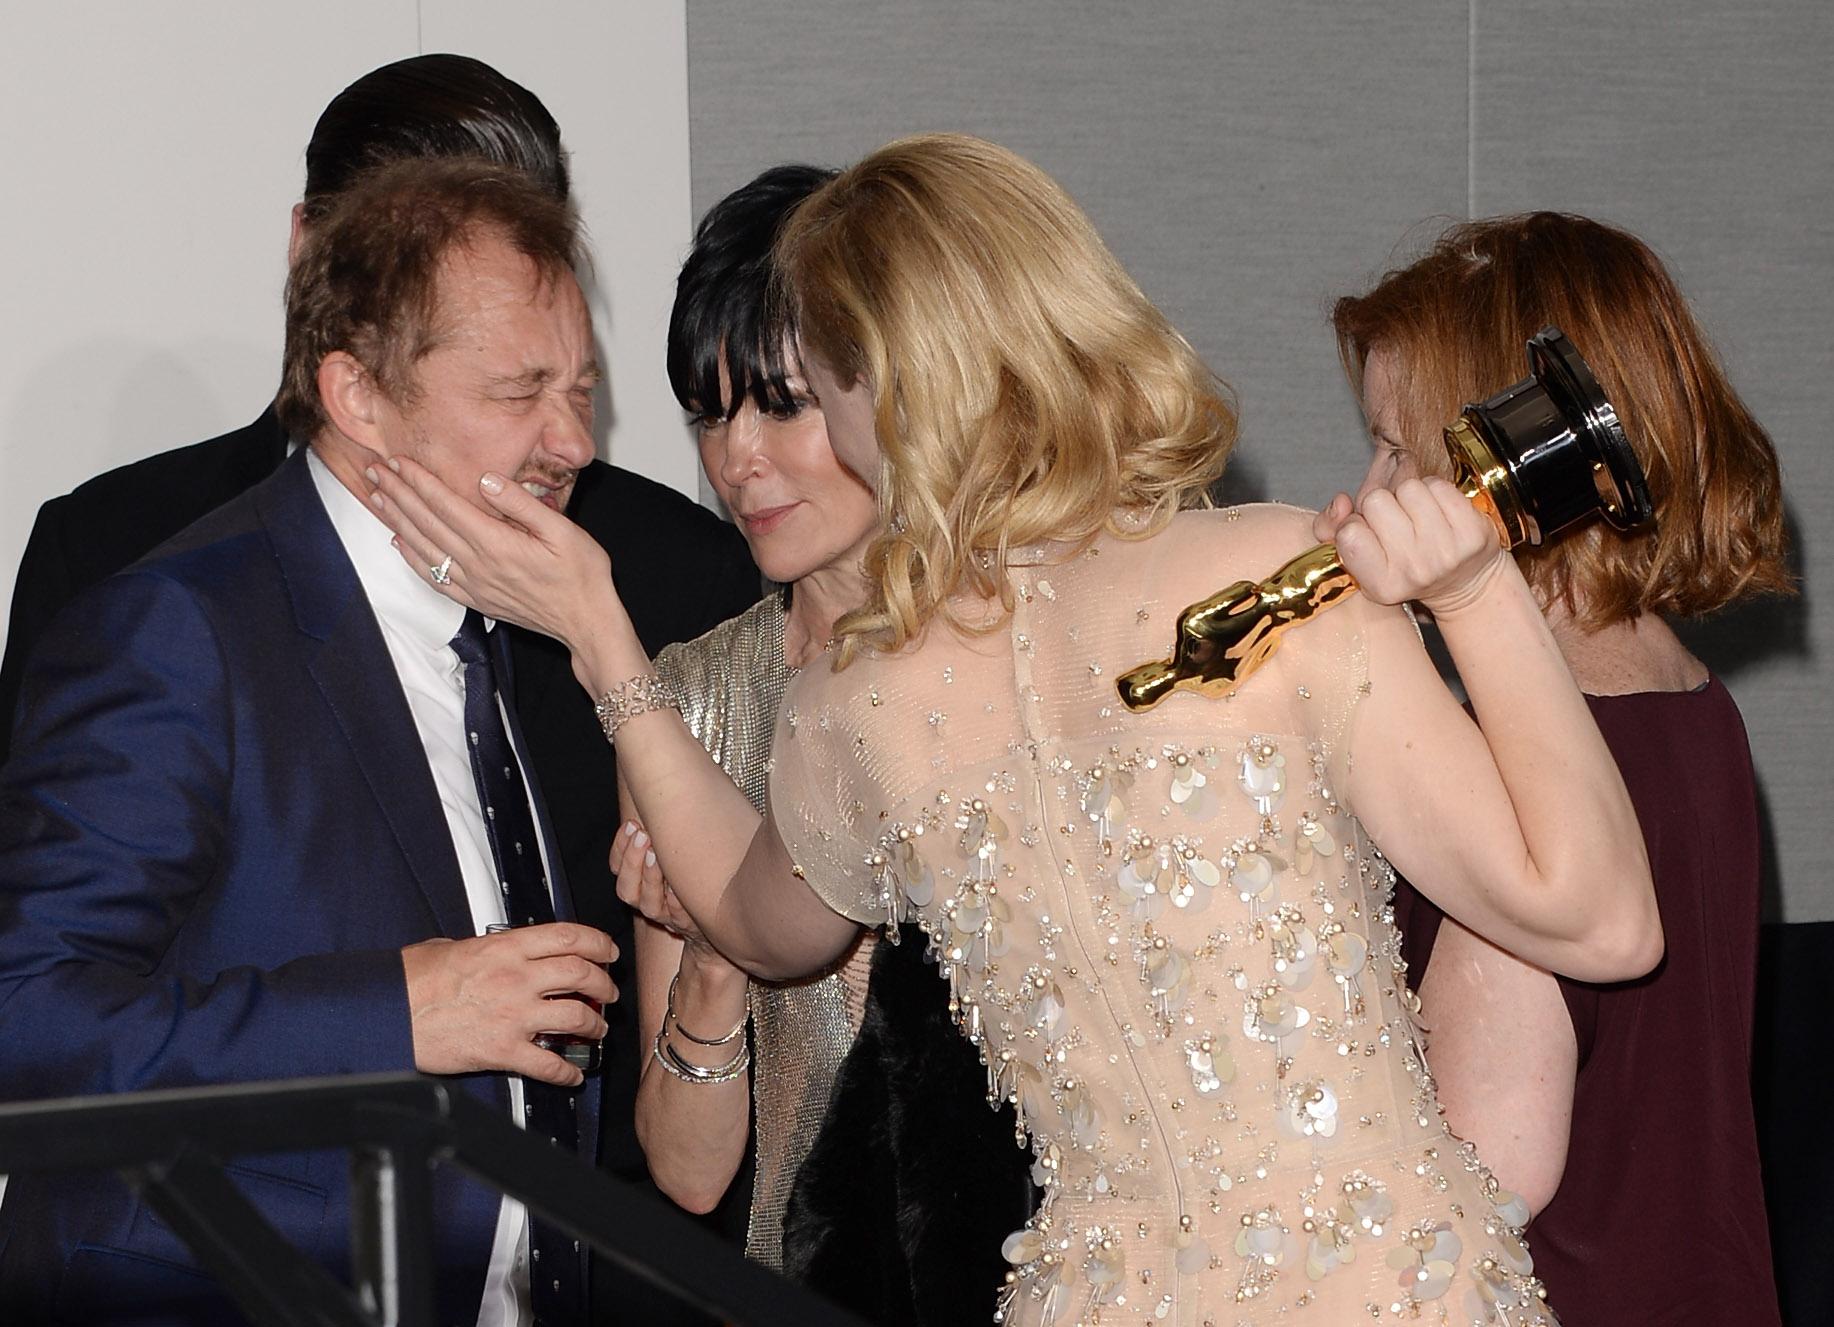 Blanchett stroked her husband Andrew Upton's cheek.